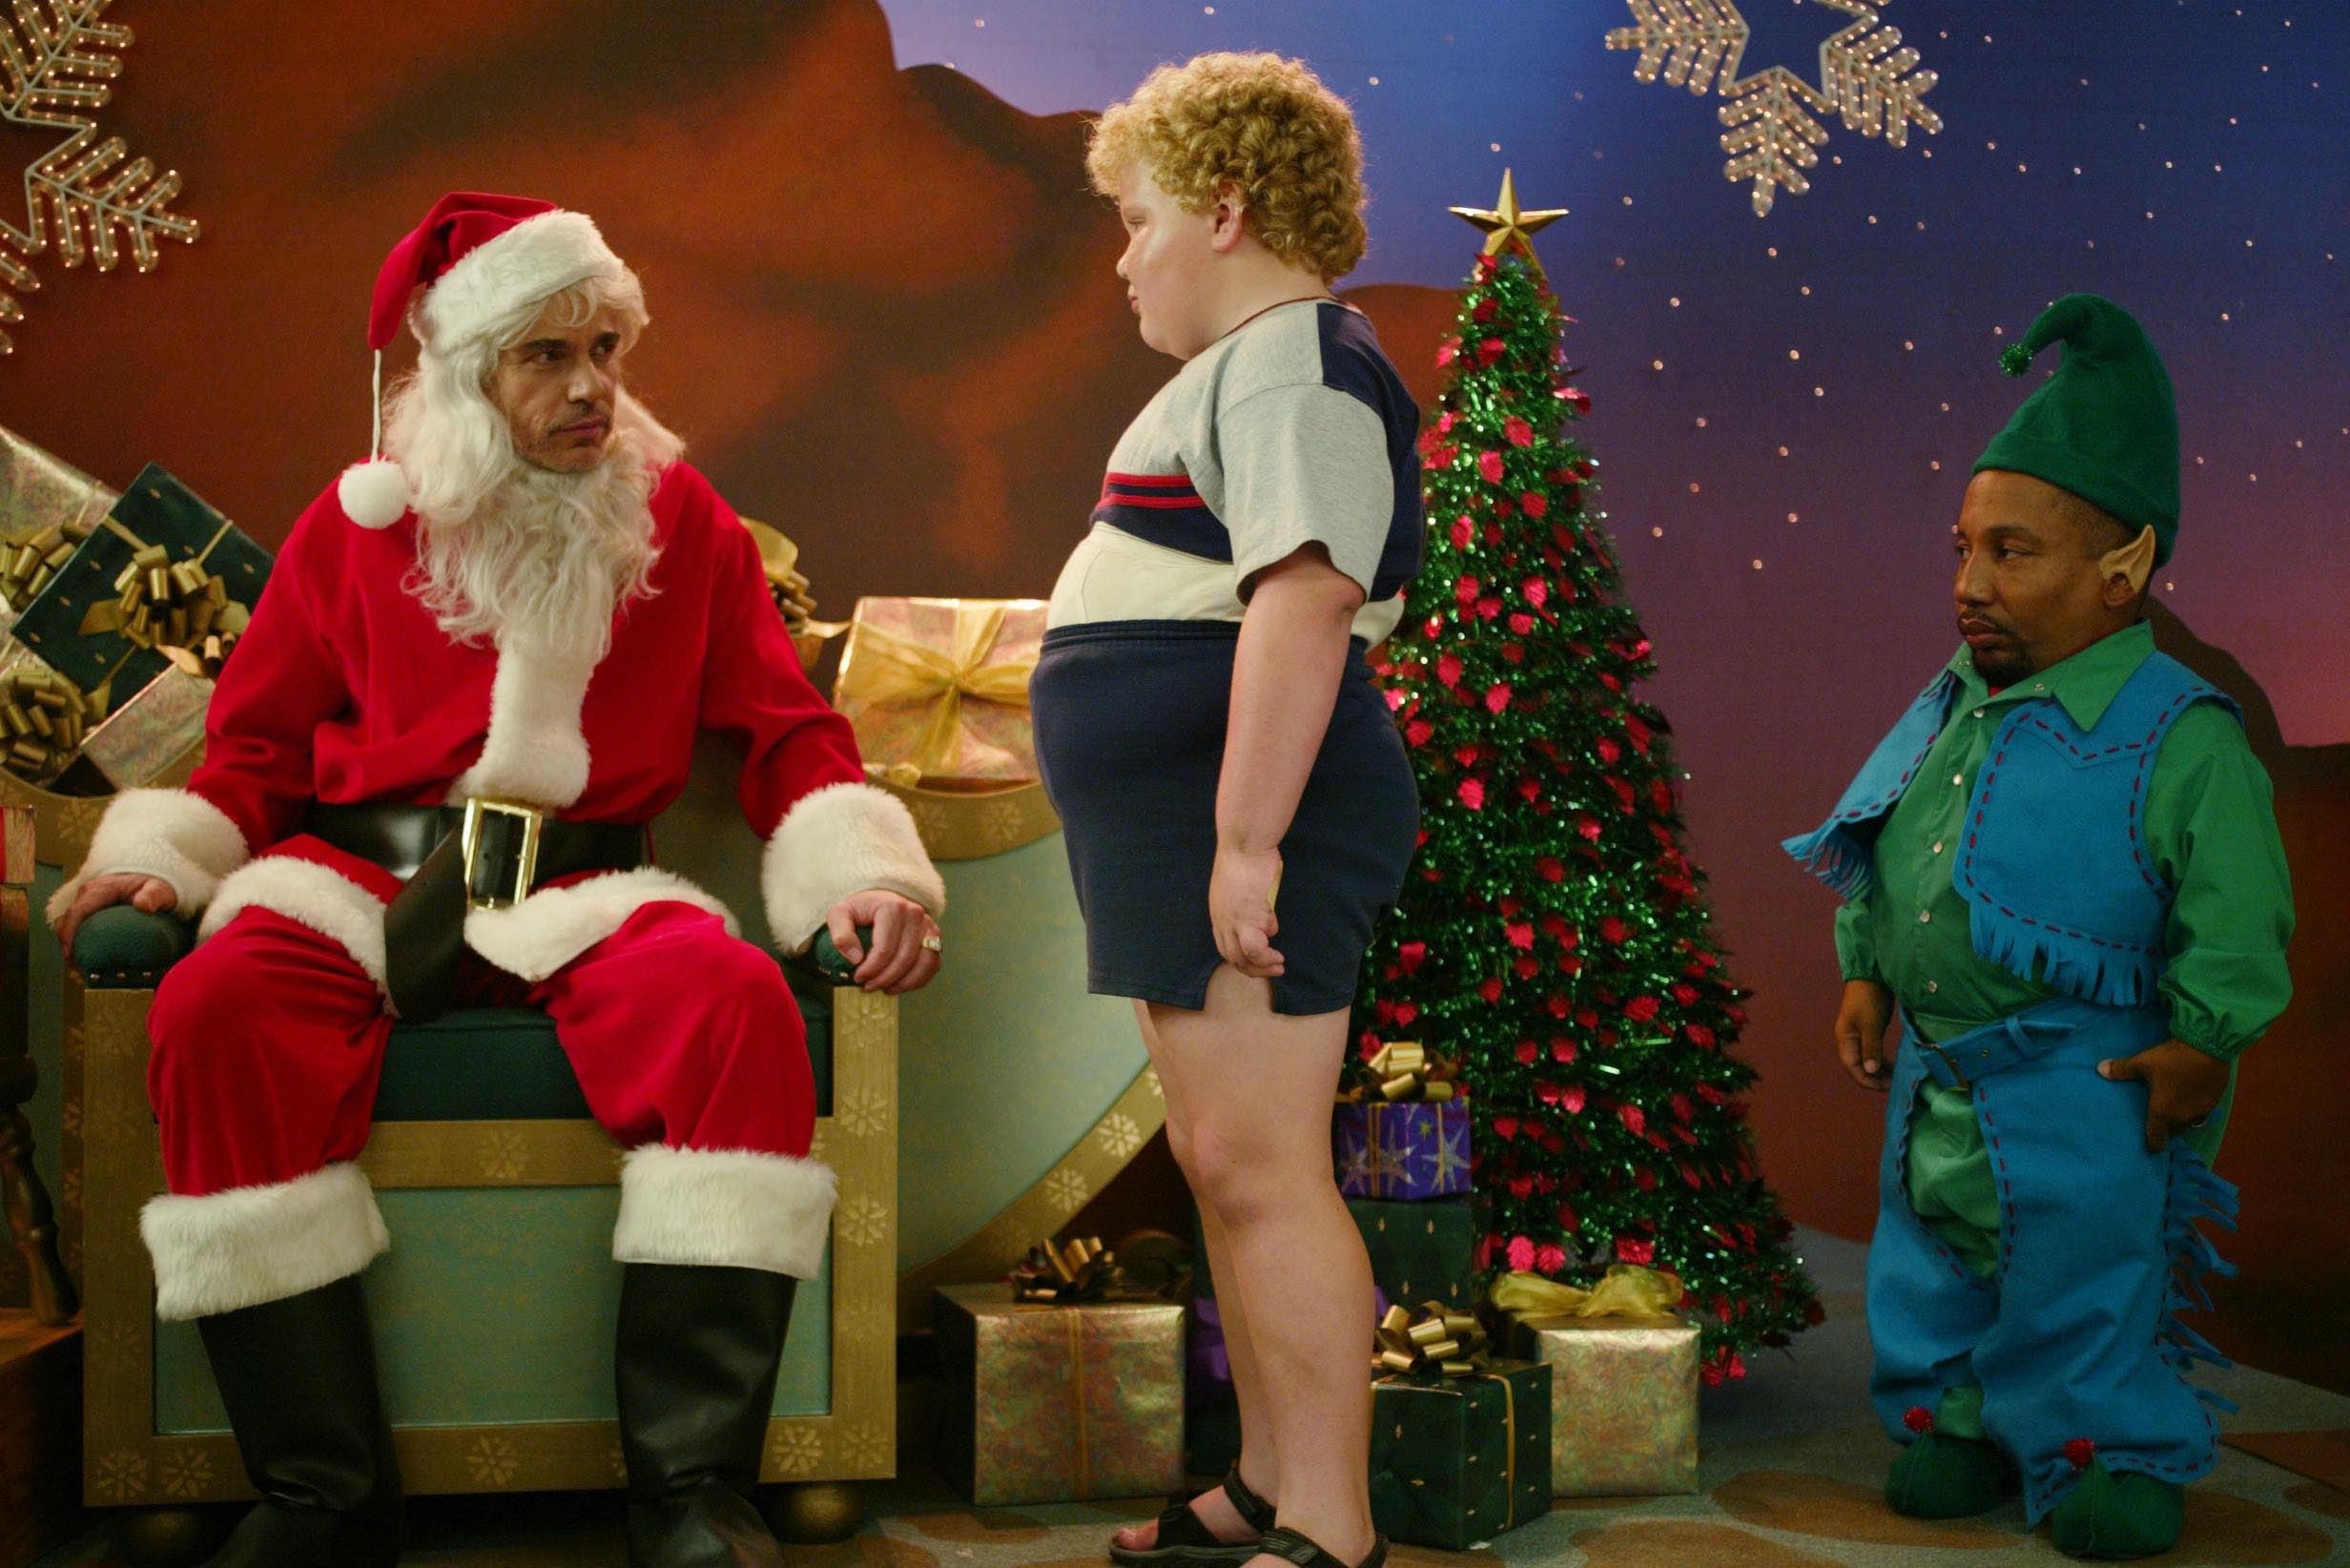 Bad Santa 2 Background